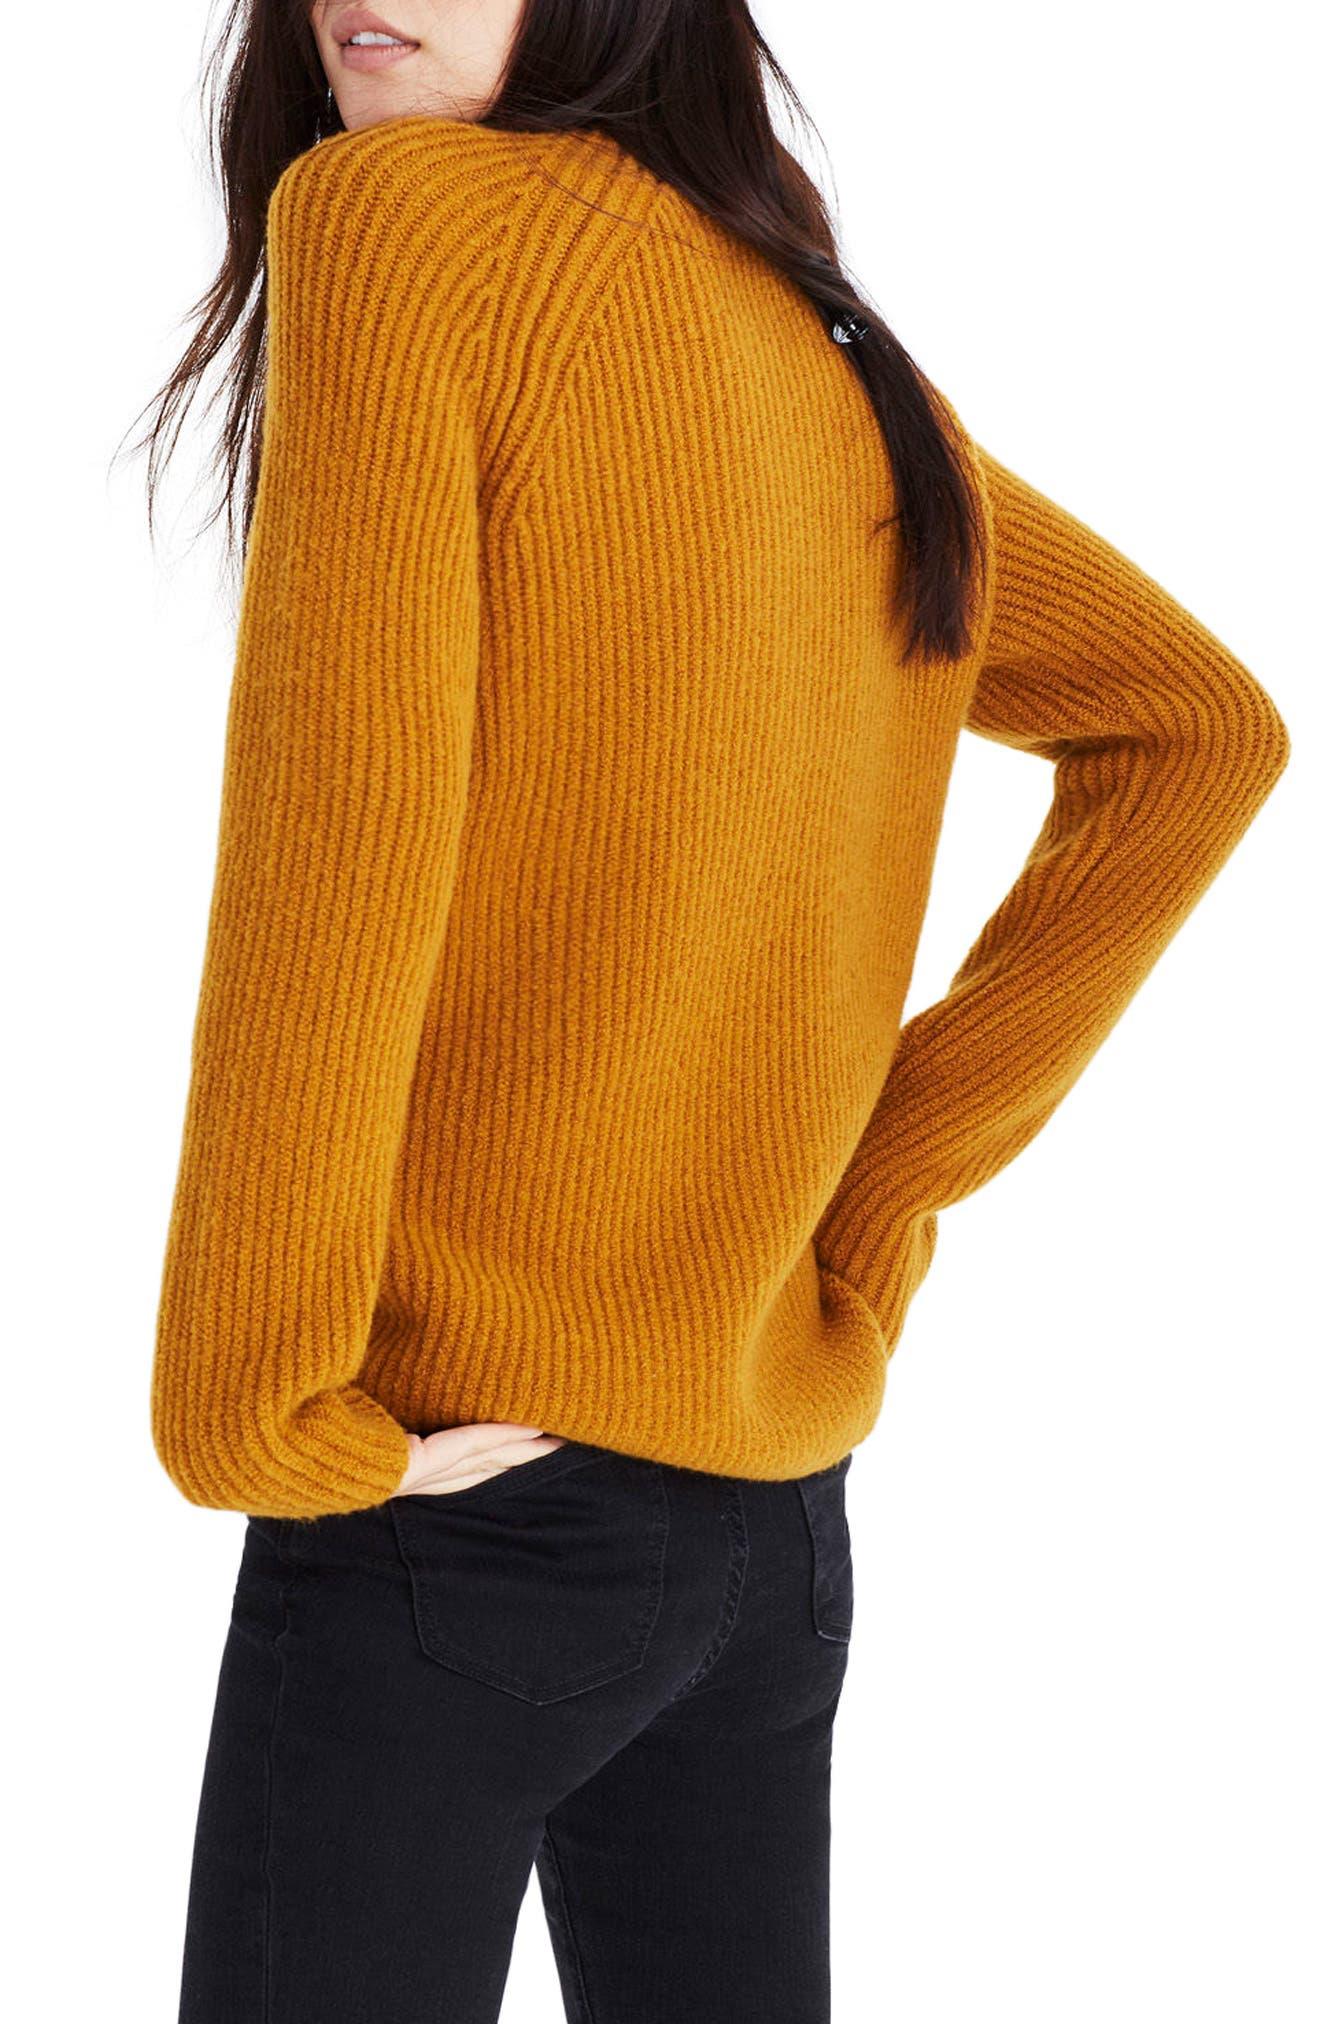 MADEWELL, Northfield Mock Neck Sweater, Alternate thumbnail 2, color, 800